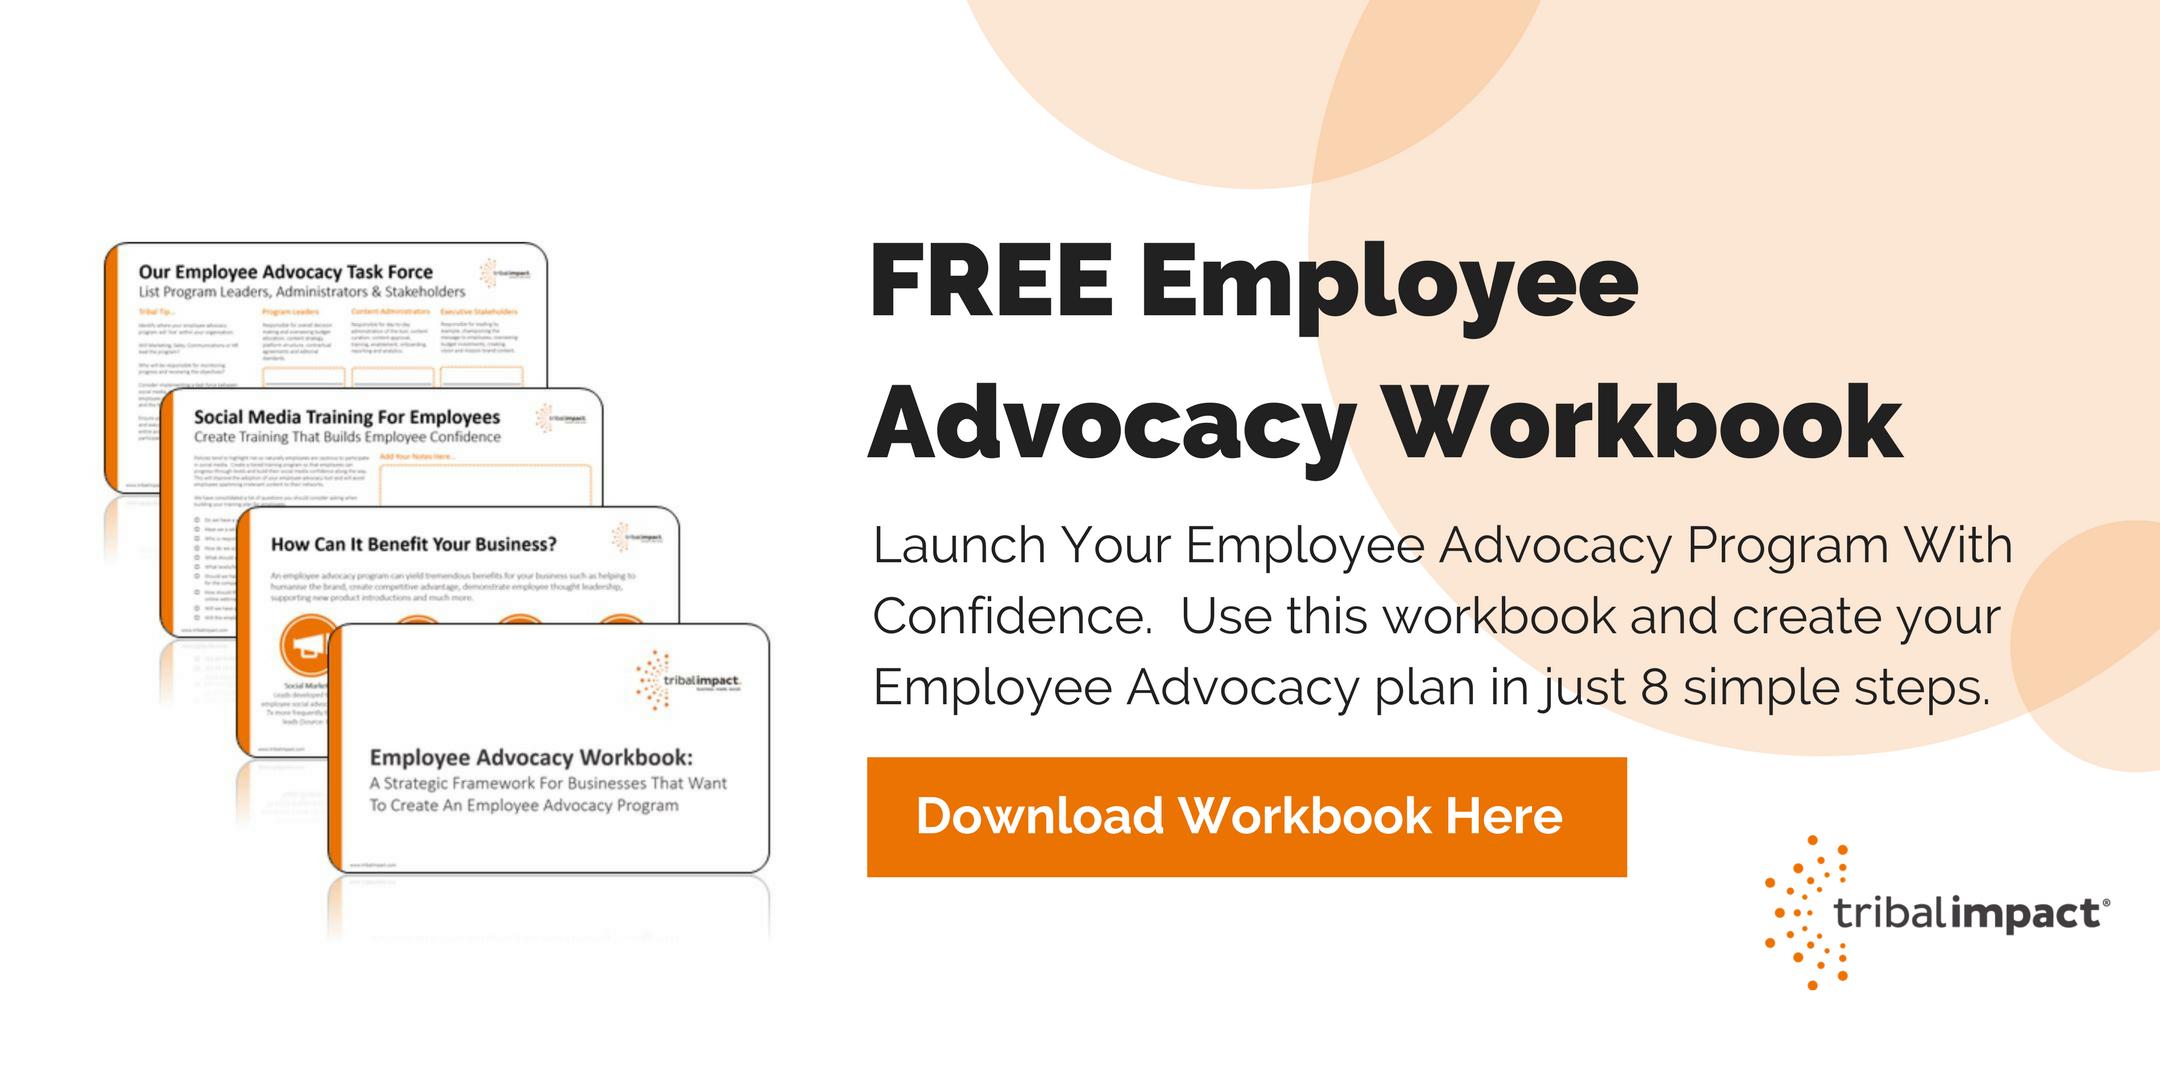 Download Employee Advocacy Workbook